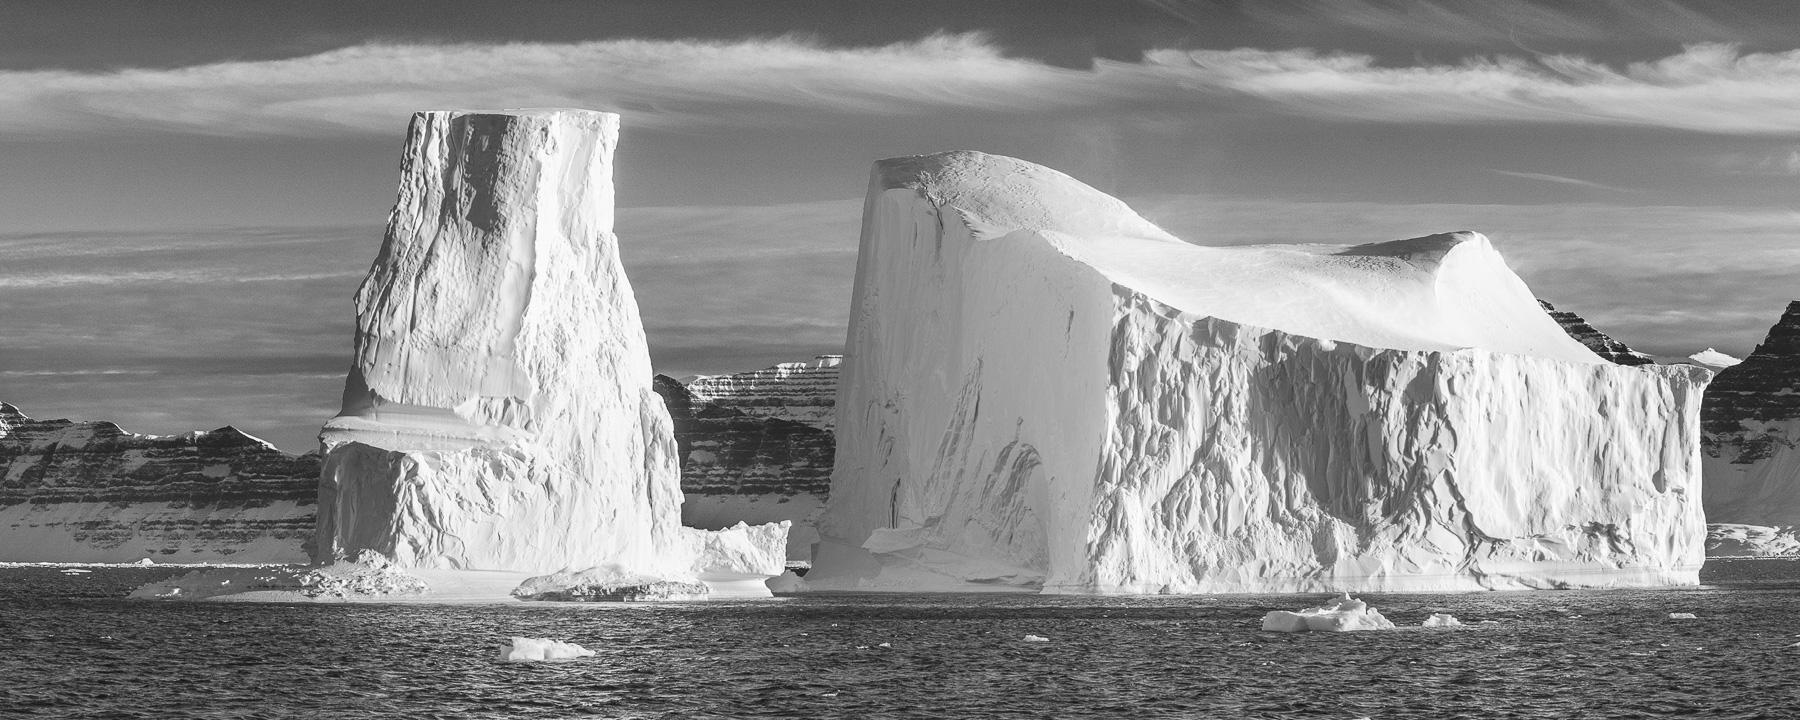 icebergs bw